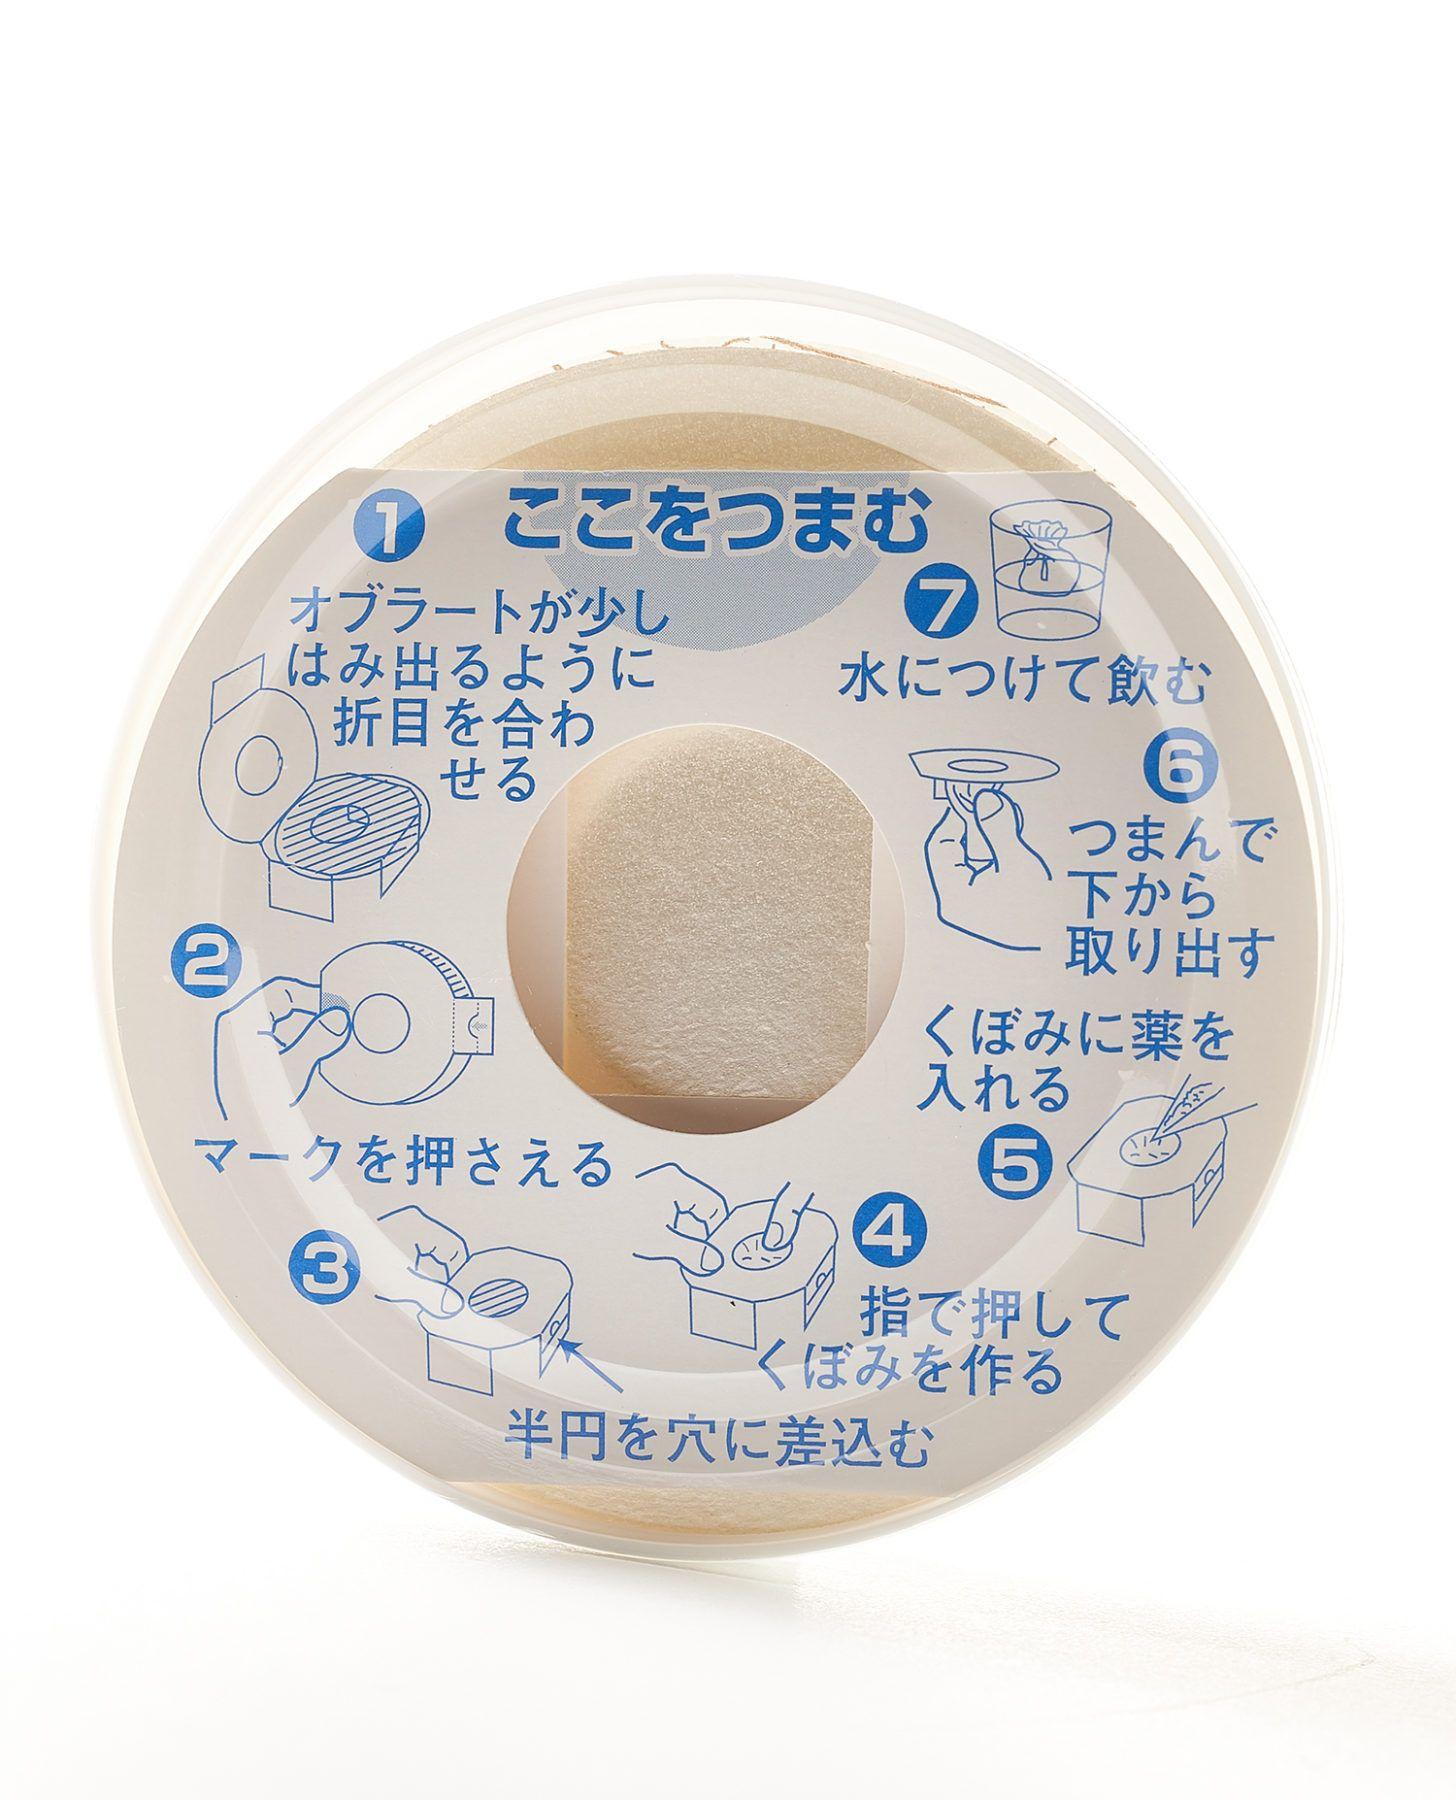 Obulato Redondo (9 Cm Ø)- Caja 100